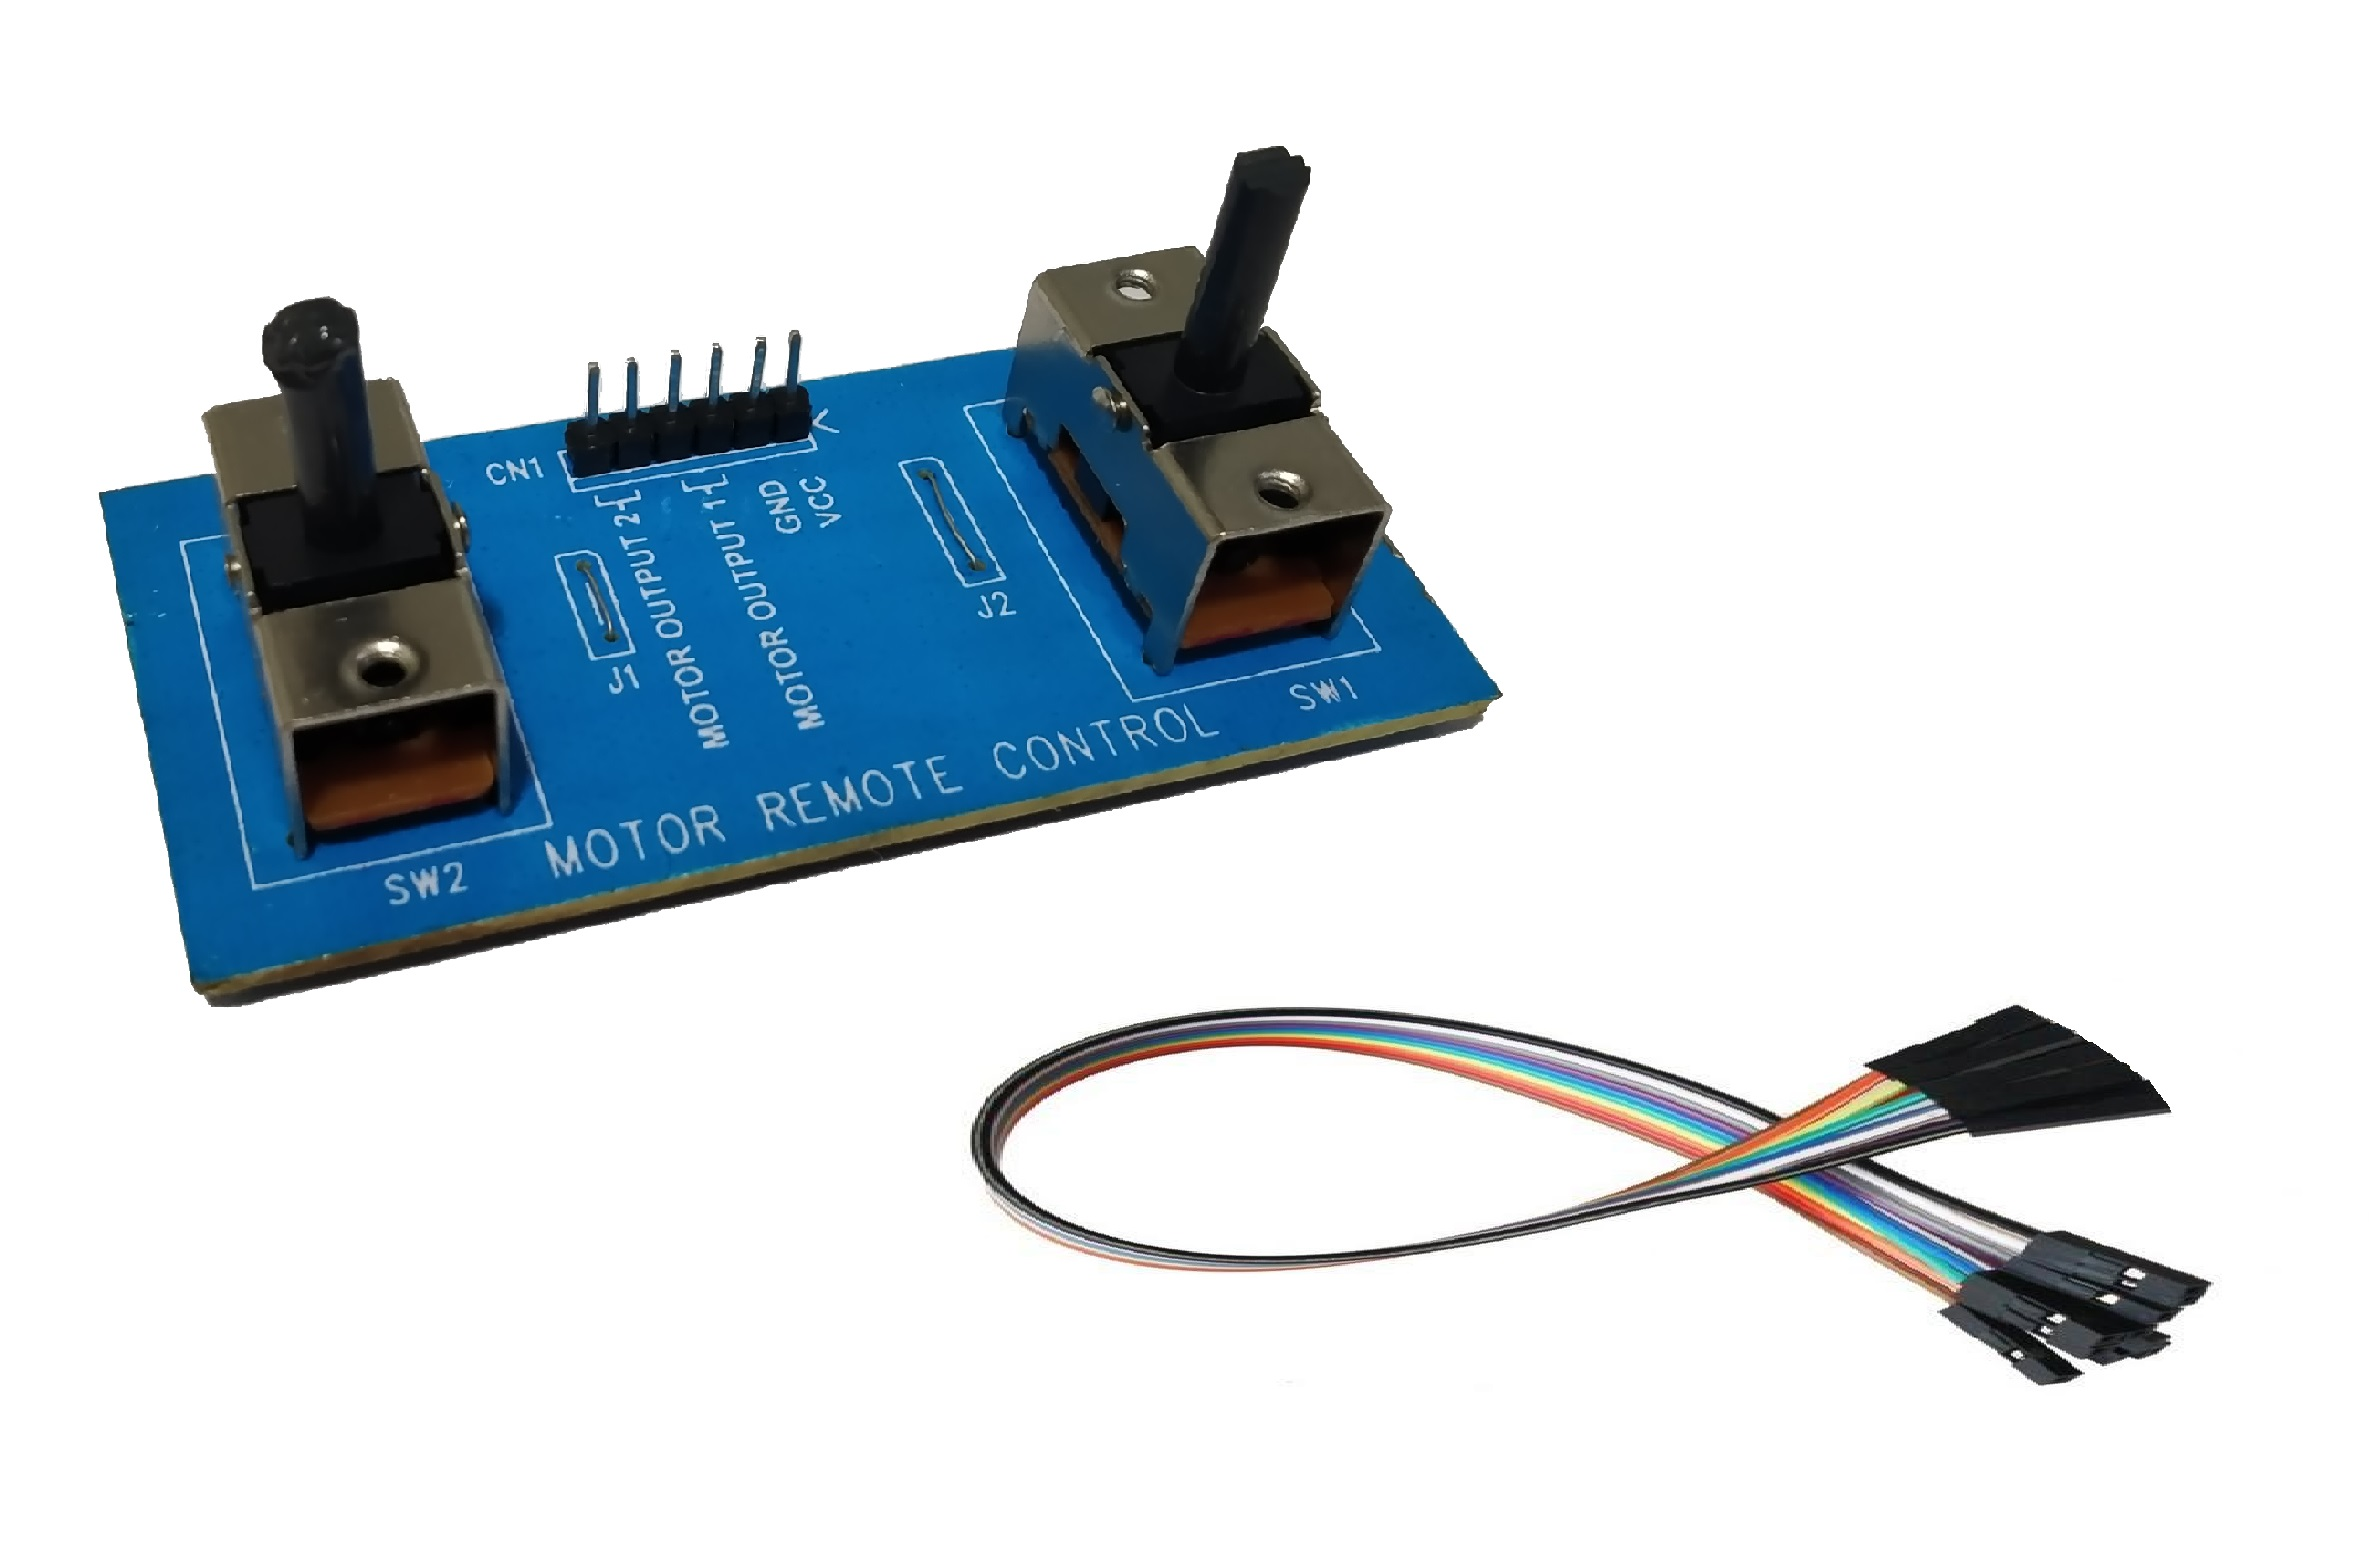 joystick joystick module joystick remote joystick board dpdt joystick joystick remote robot remote